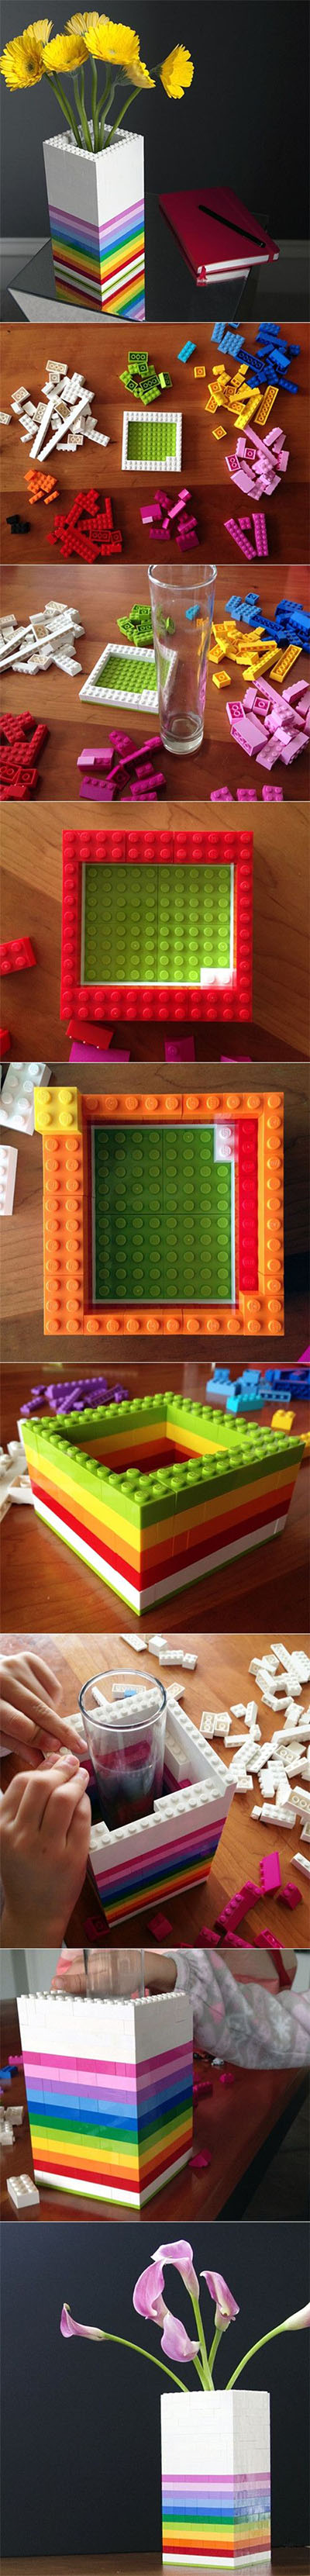 5 DIY Lego Vase 818dce4